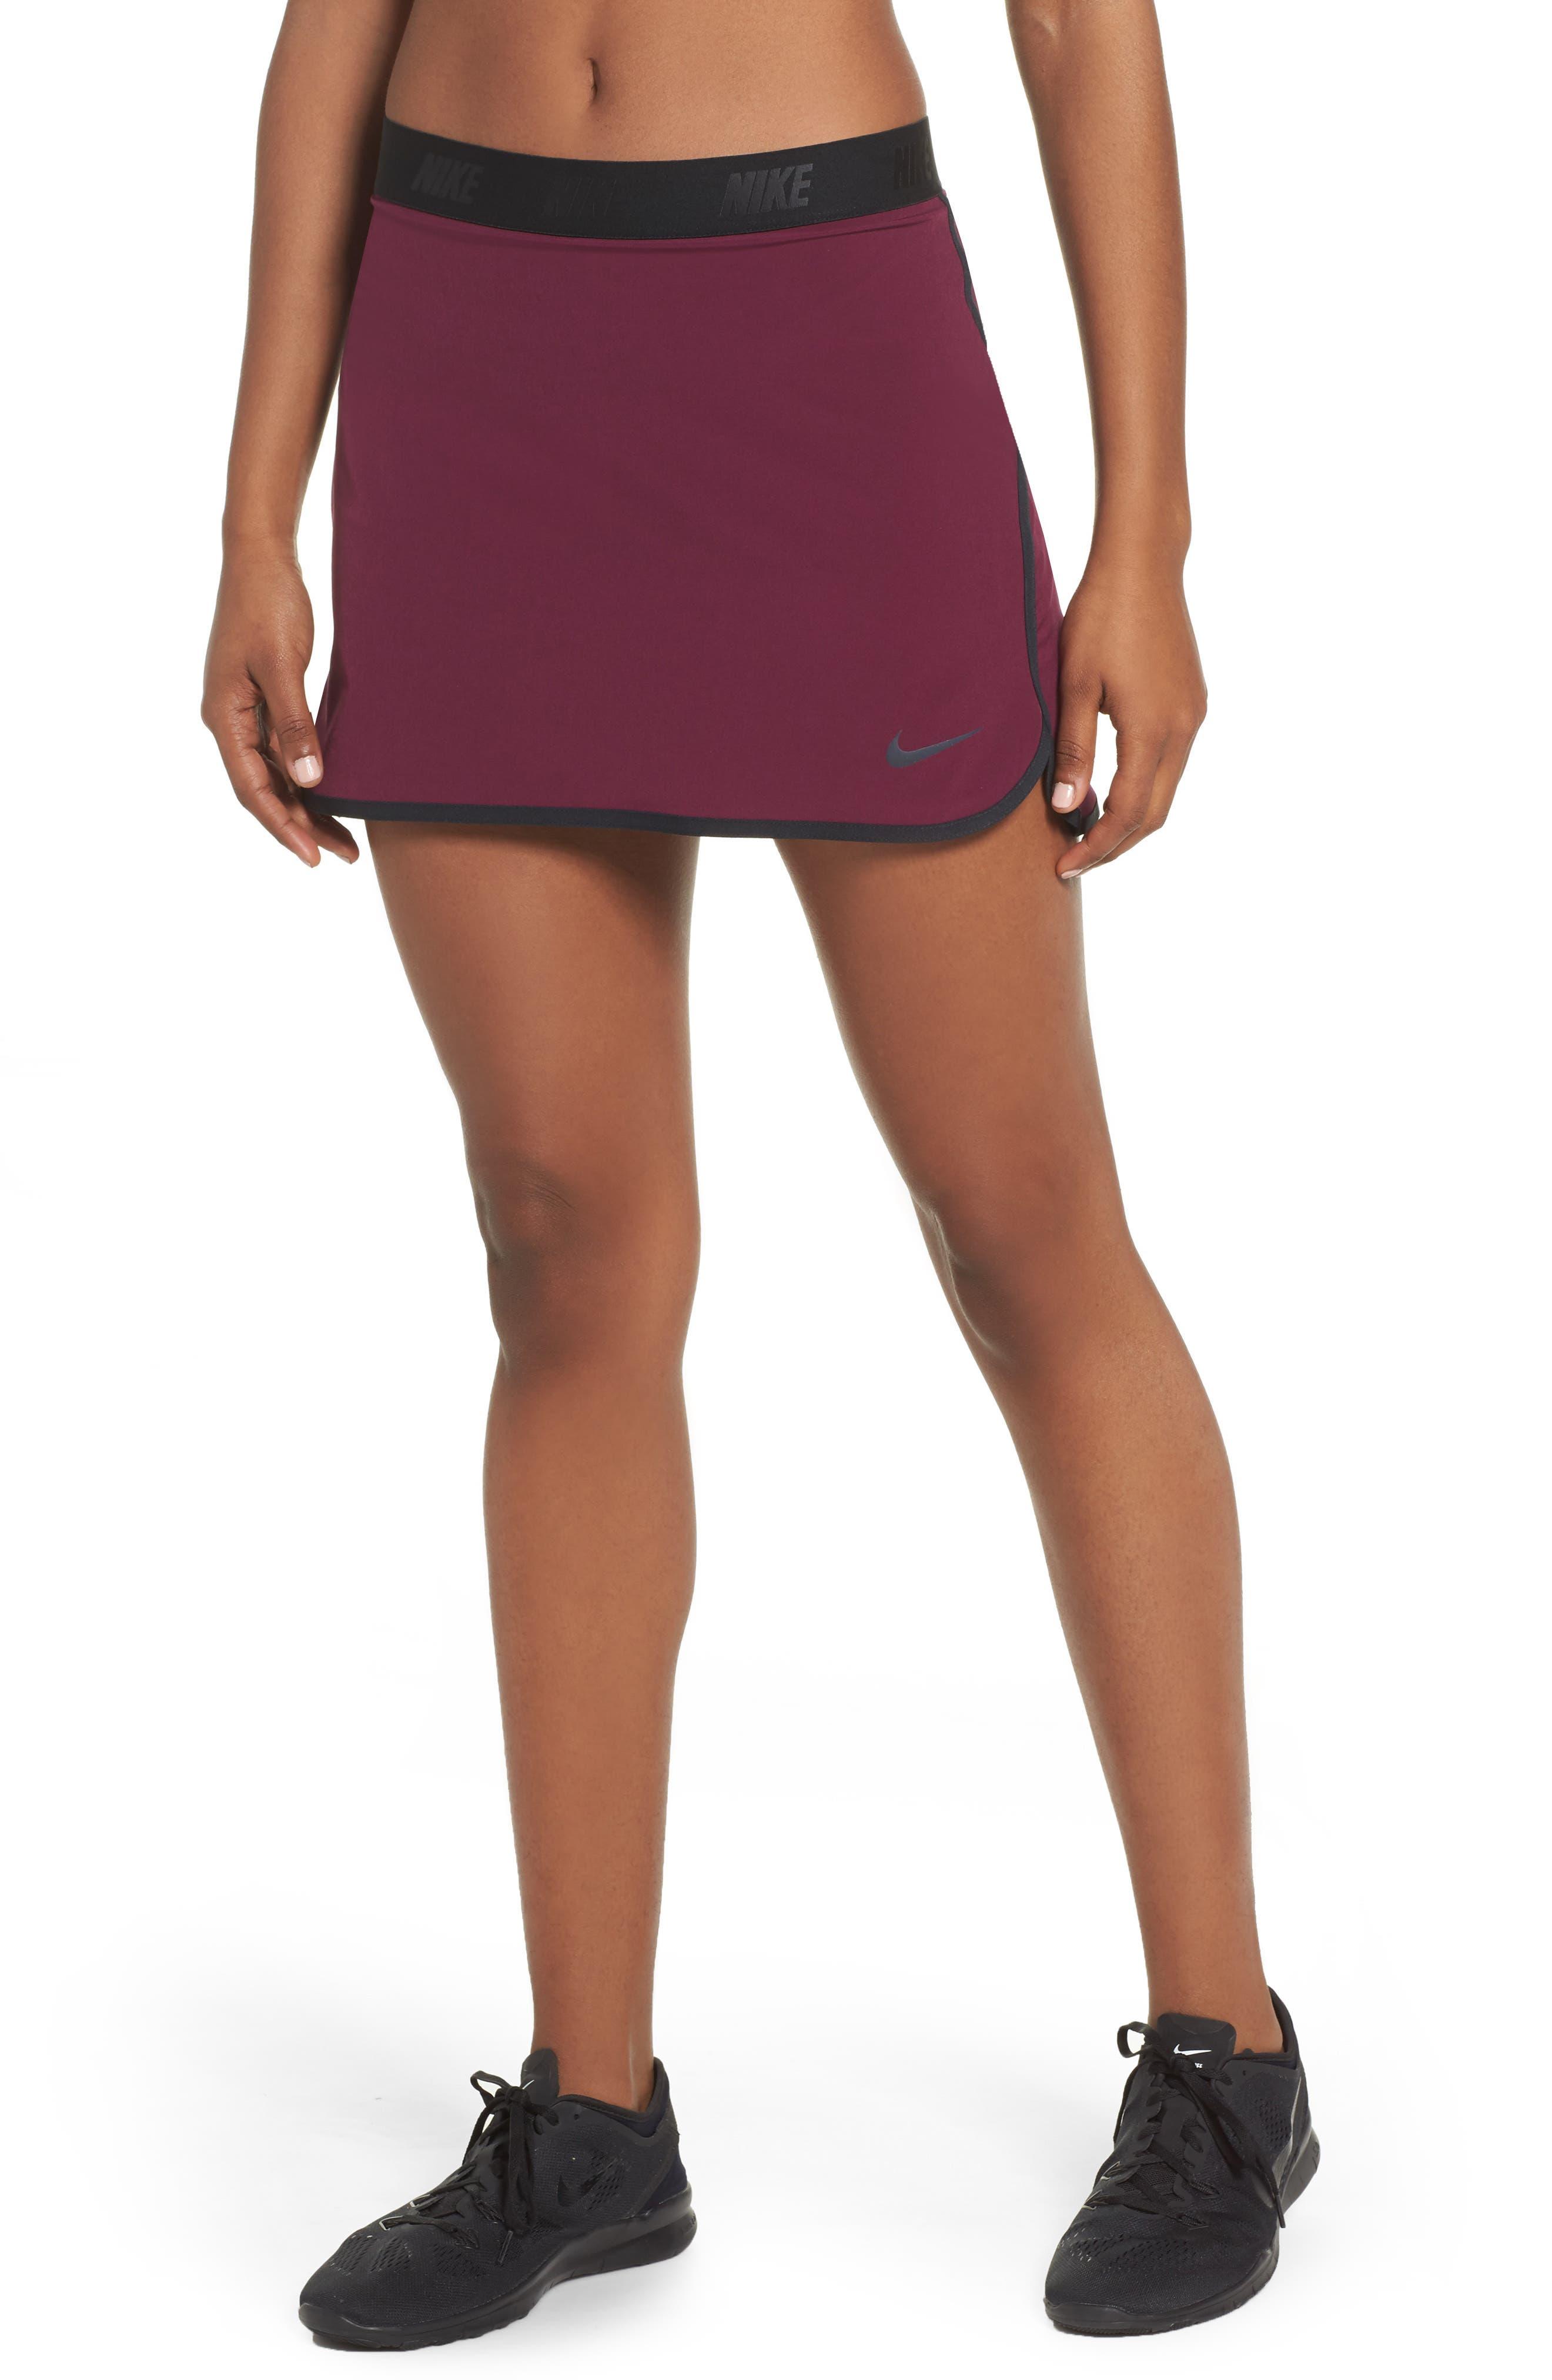 Flex Tennis Skirt,                         Main,                         color, 930